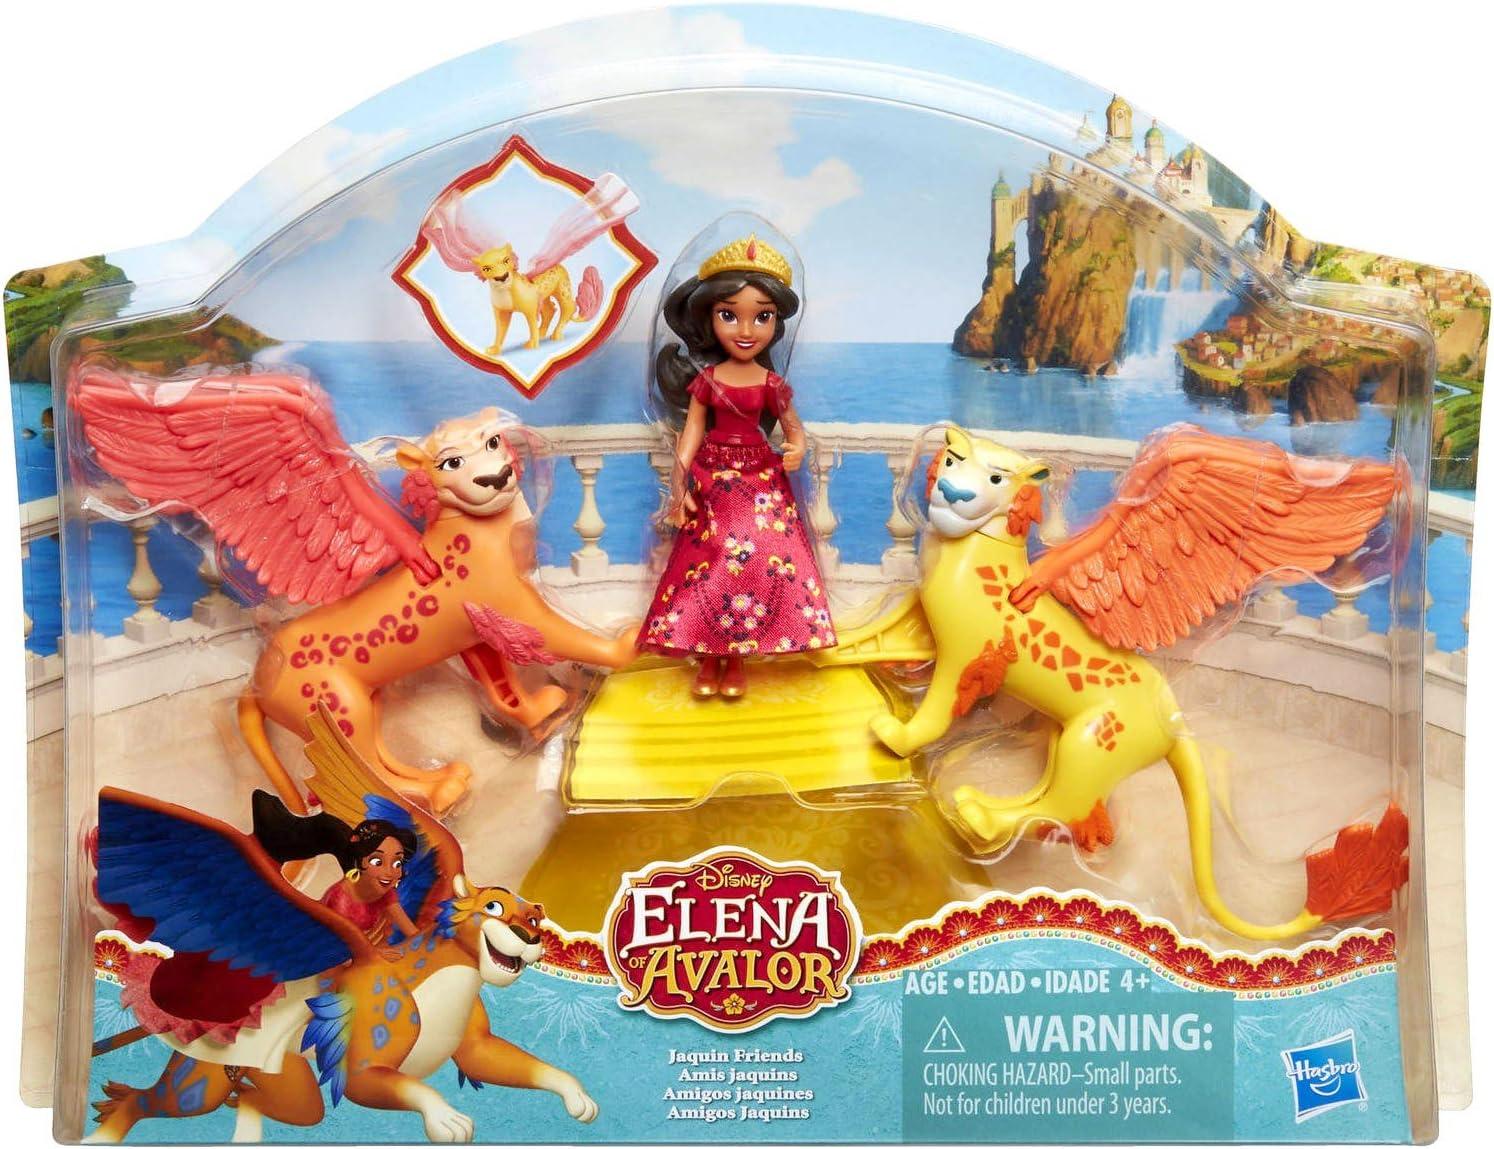 Disney Junior Elena of Avalor Jaquin Friends 3-Pack